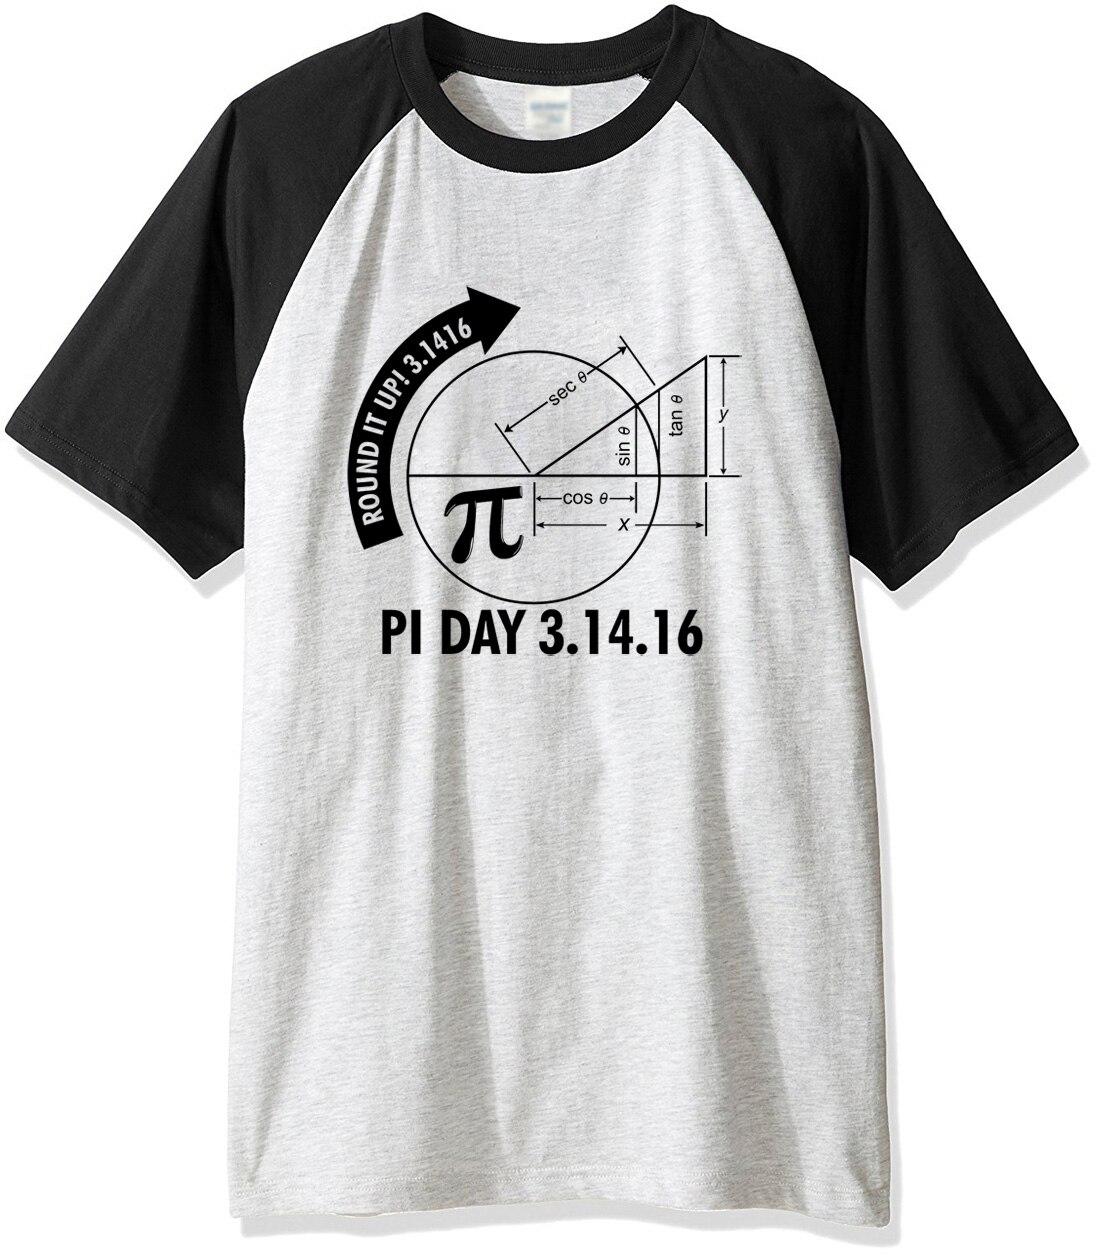 Hot 2017 summer tshirt Pi Day 3.1416 Round It Up Math Graph STEM t-shirt harajuku streetwear fitness clothes raglan t shirt men